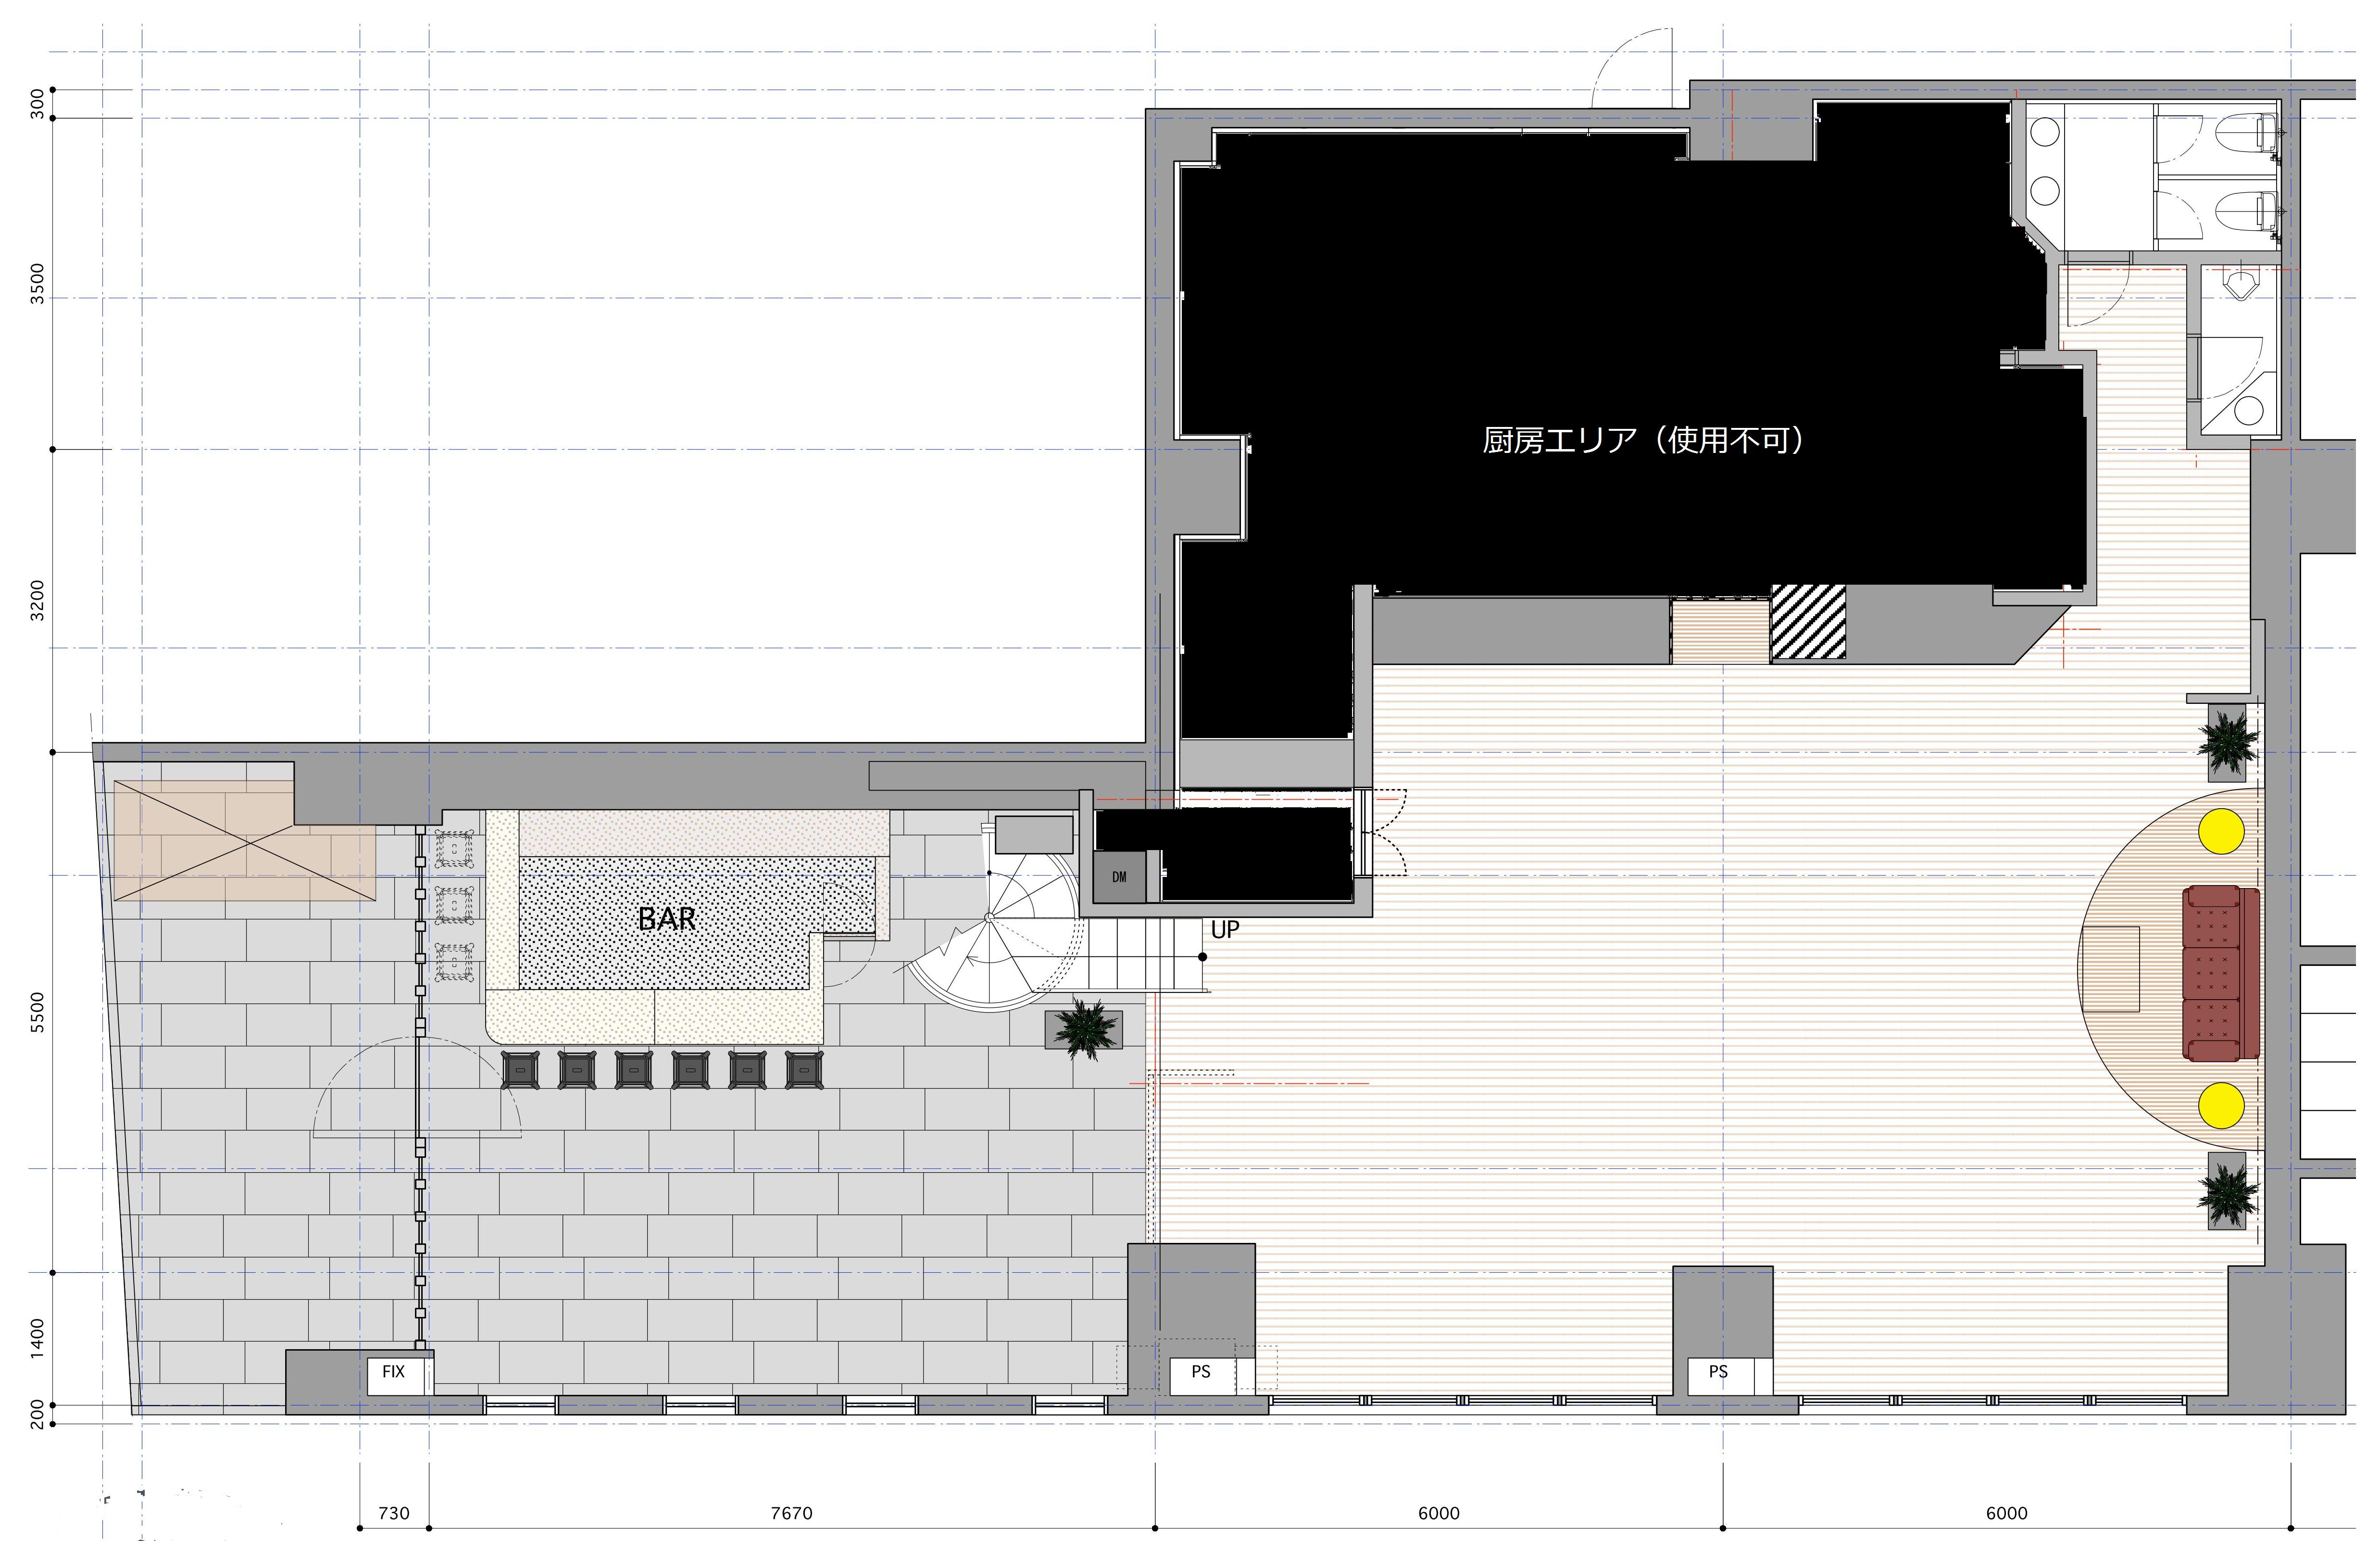 EBISU SHOW ROOM (ID:) 図面|TIME SHARING|タイムシェアリング |スペースマネジメント|あどばる|adval